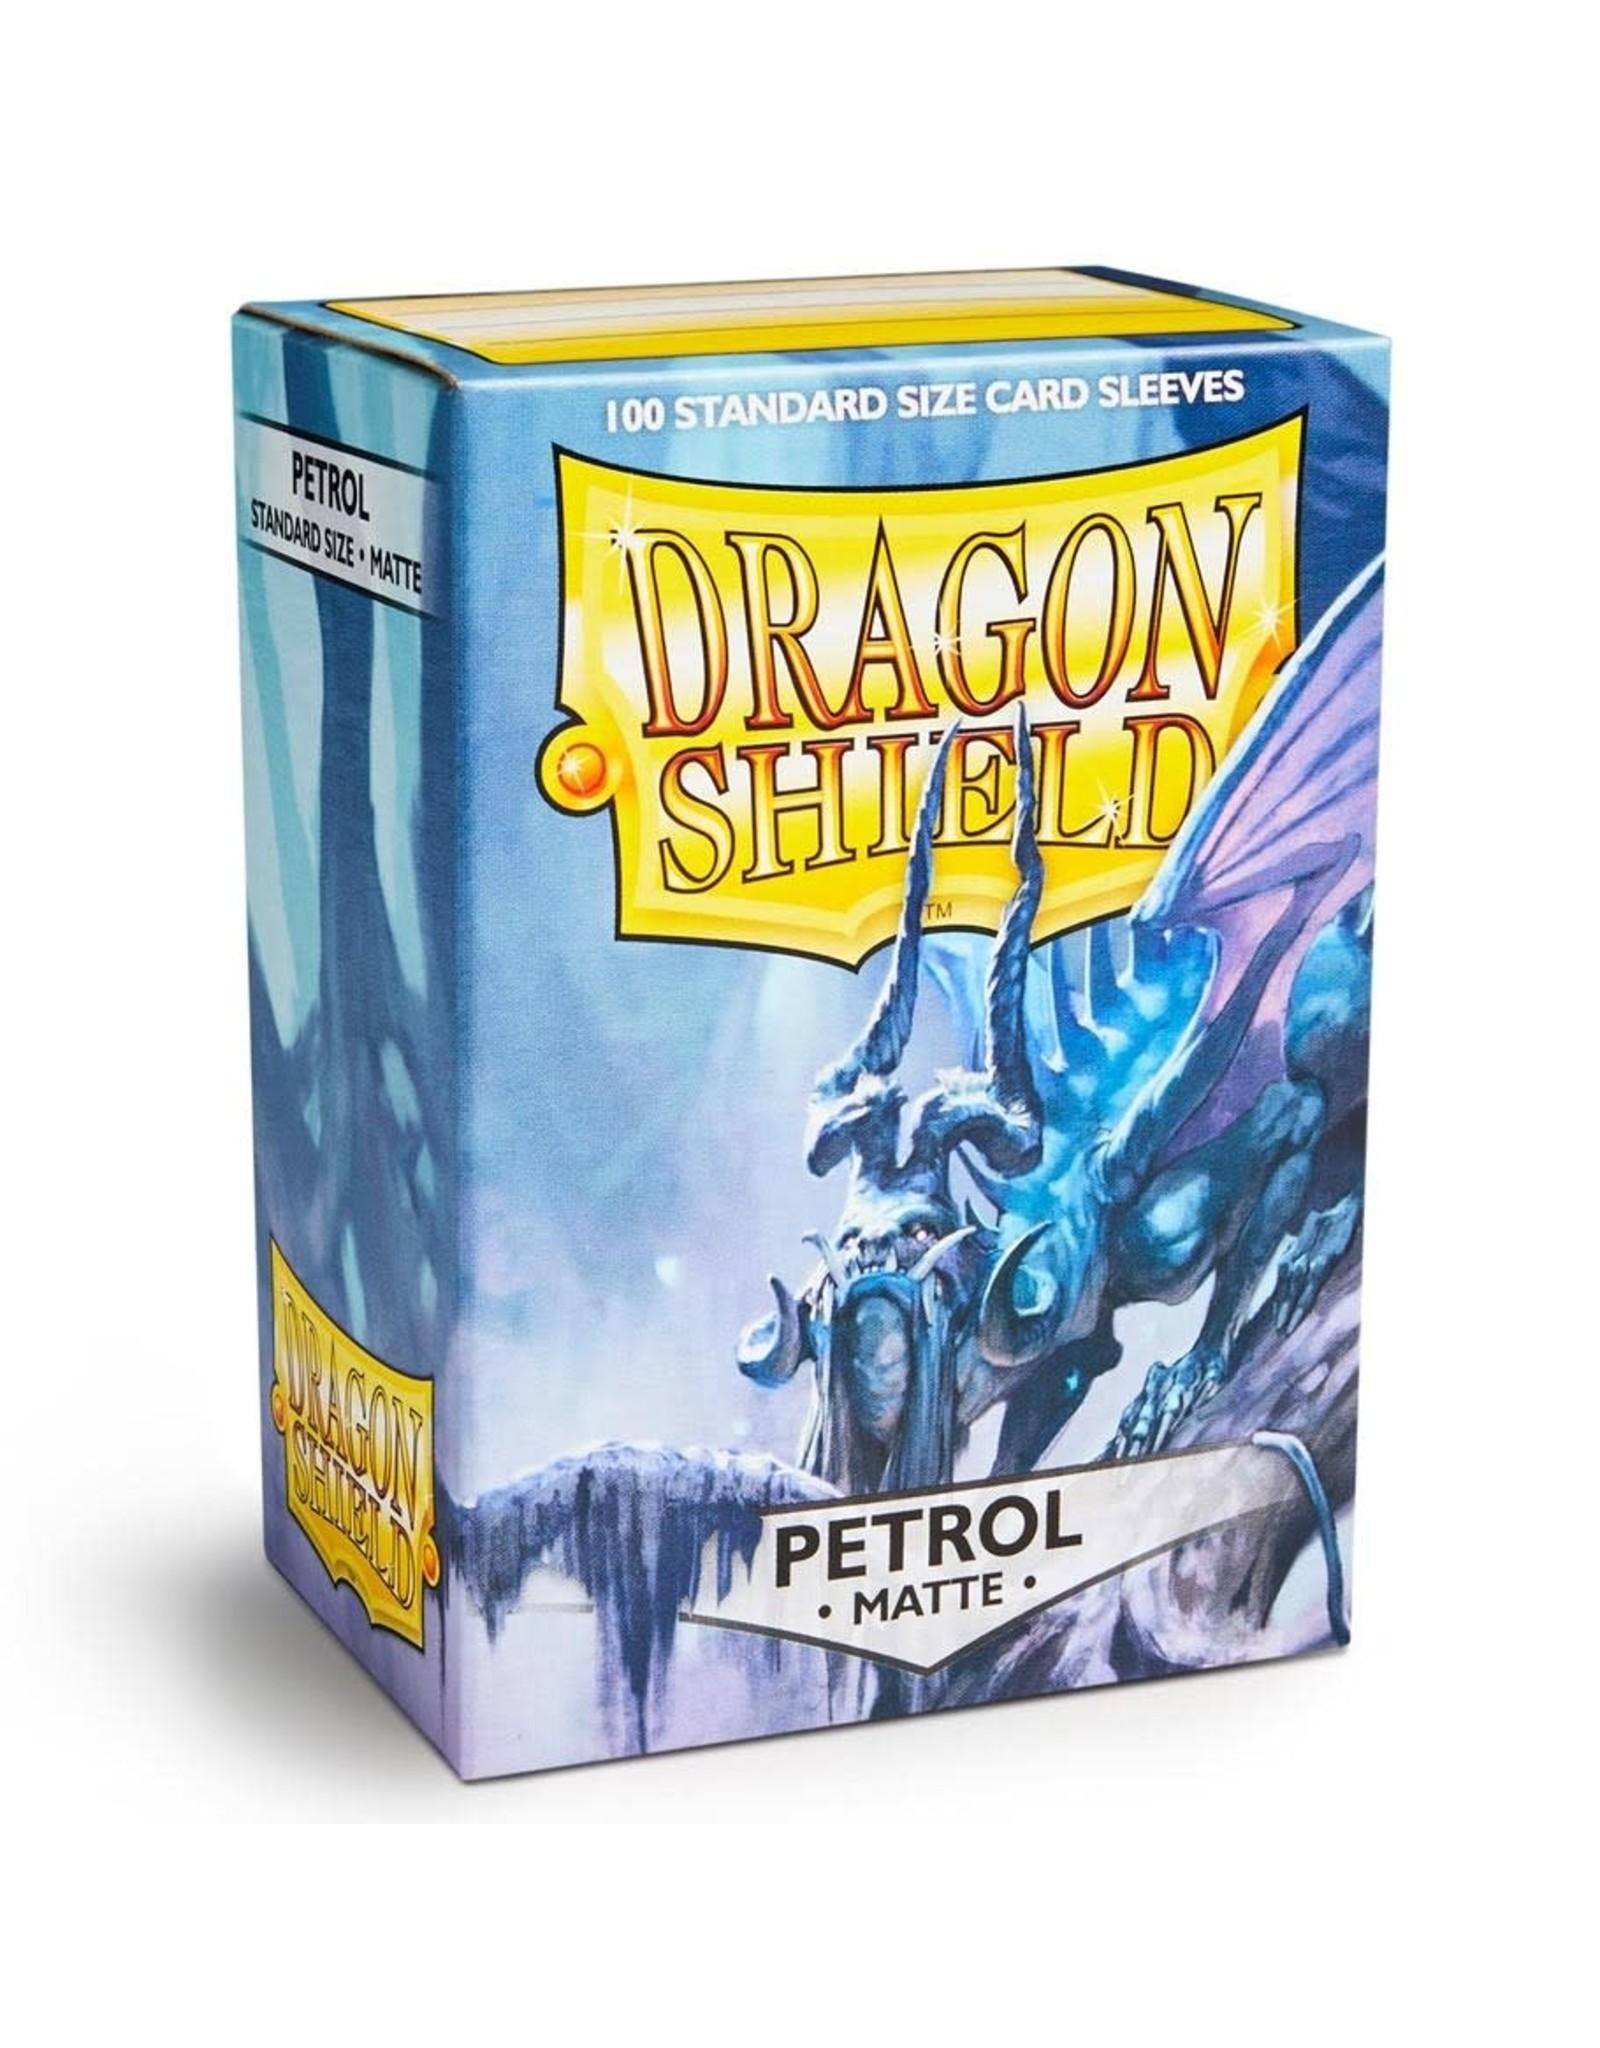 Dragon Shield Dragon Shield Matte Petrol Card Sleeves (100)